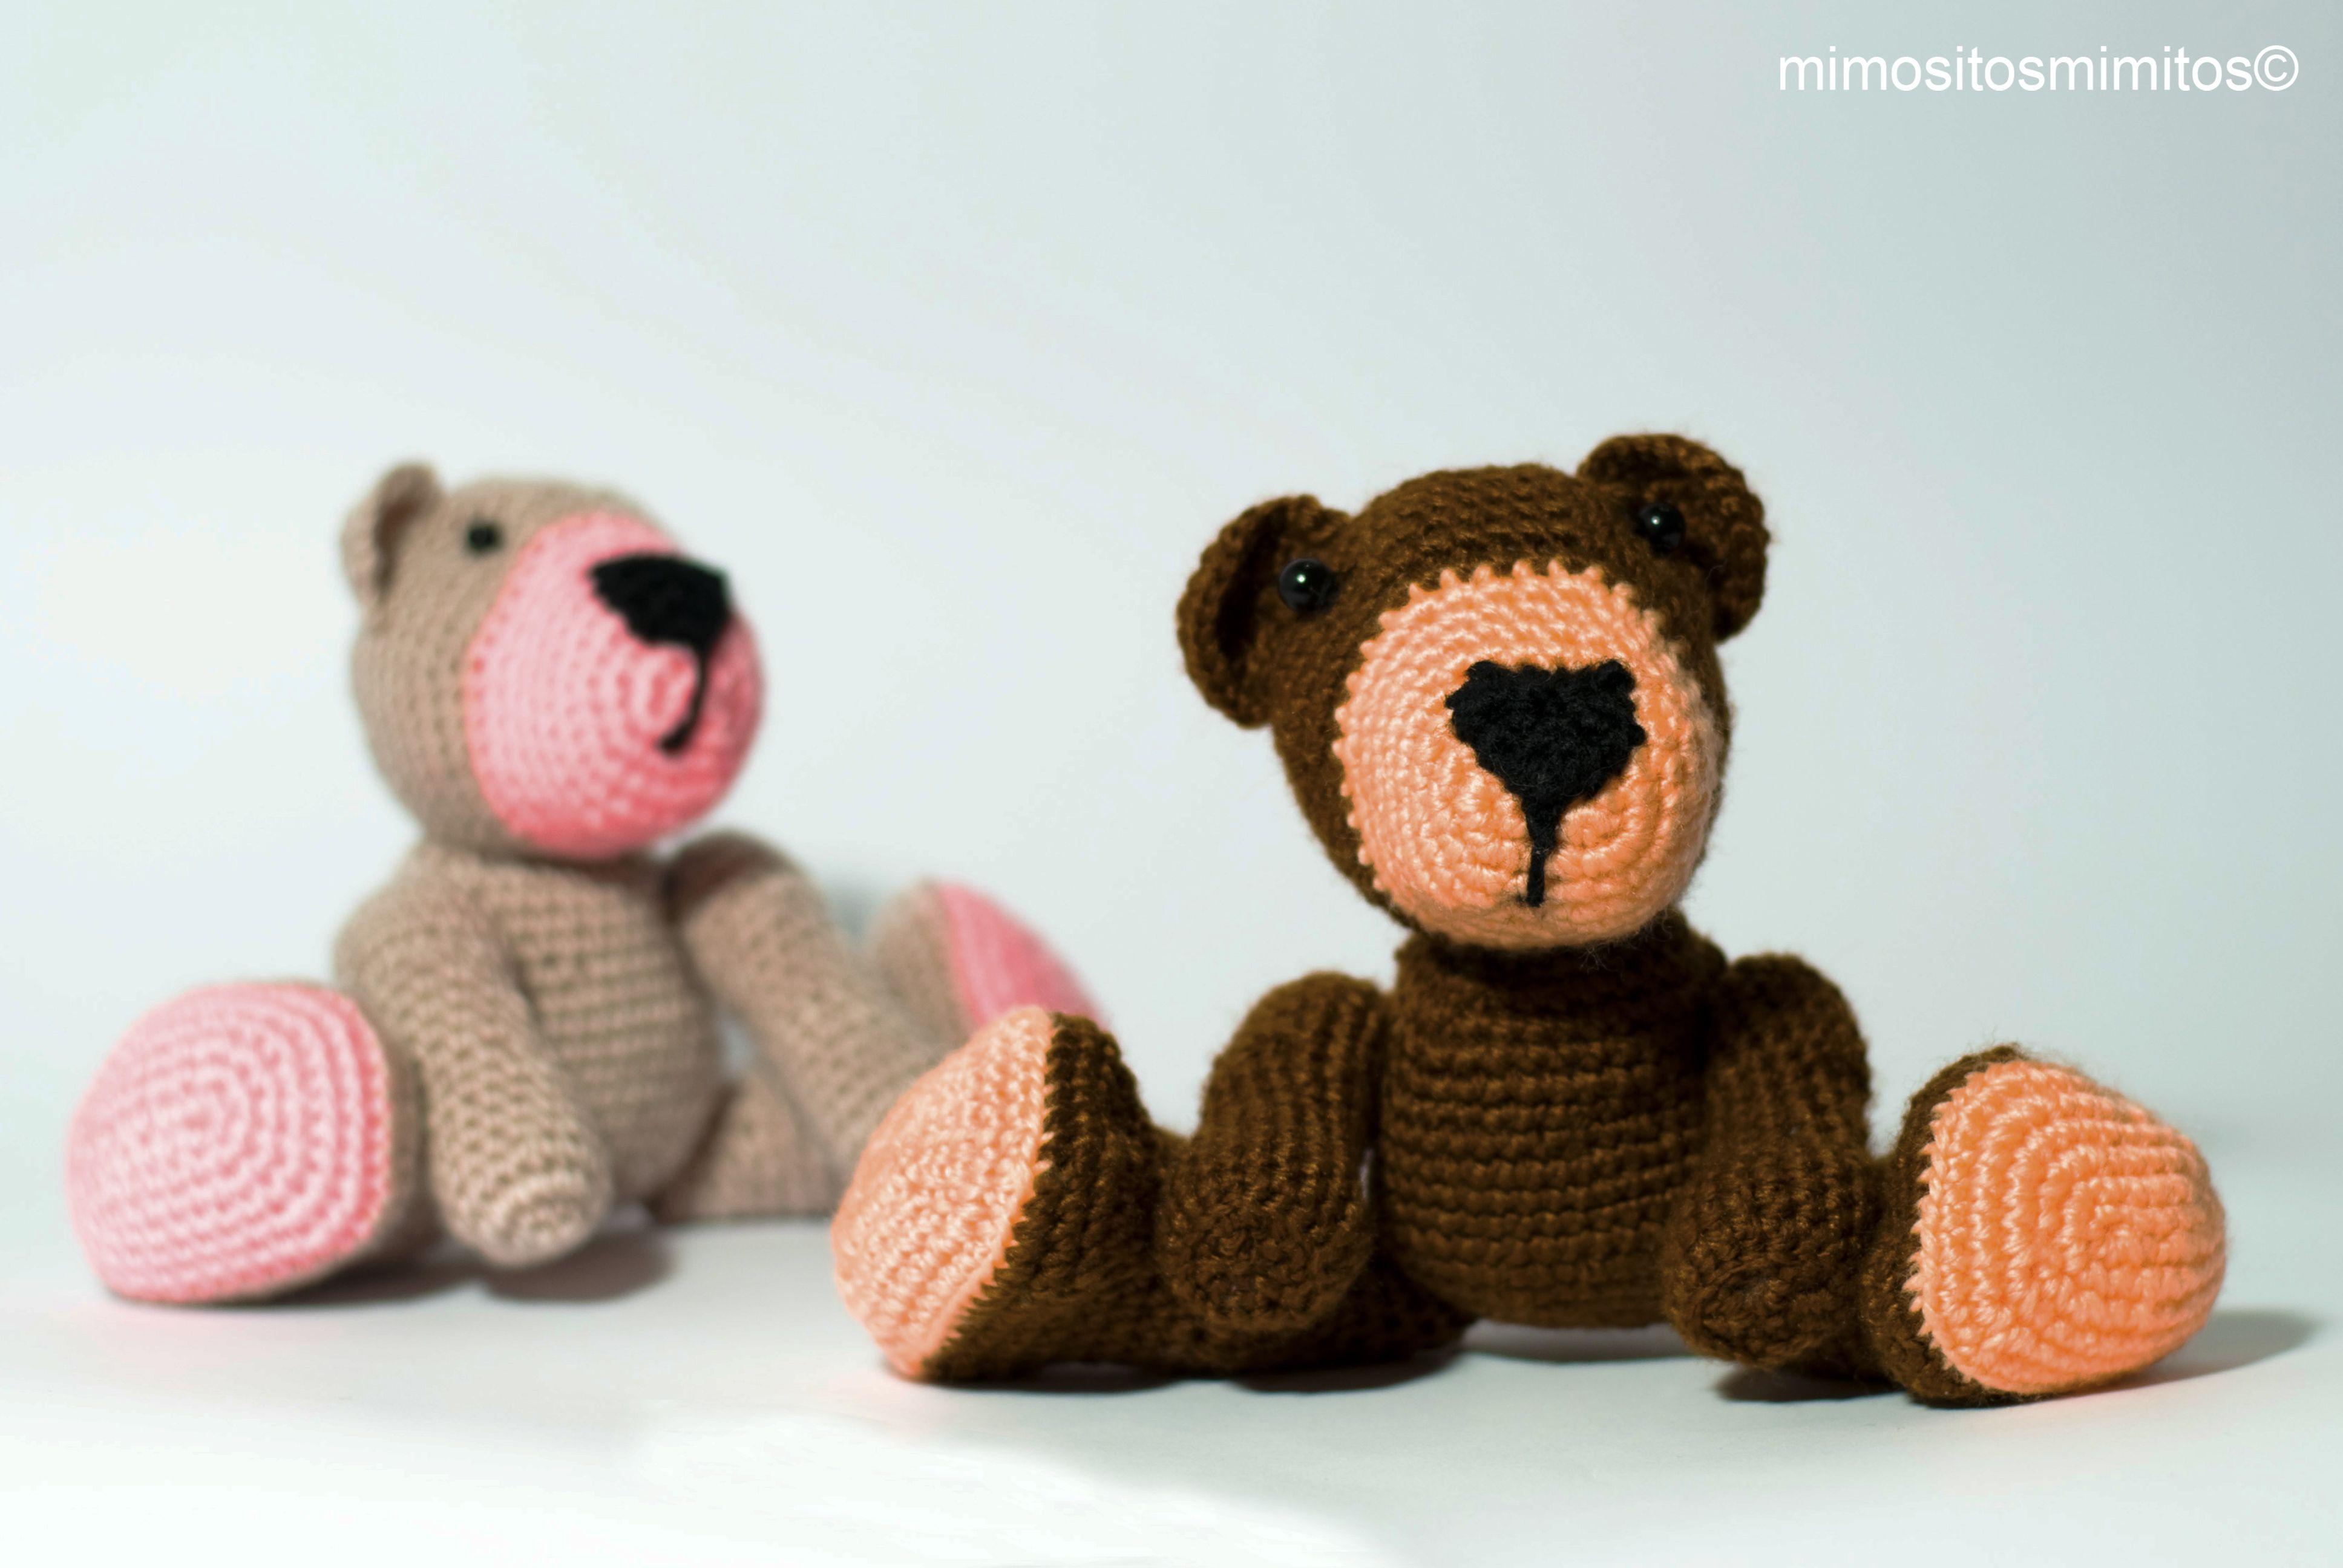 Toys images with names  oso osito amigurumi lana ganchillo crochet marrón rosa bear ugly